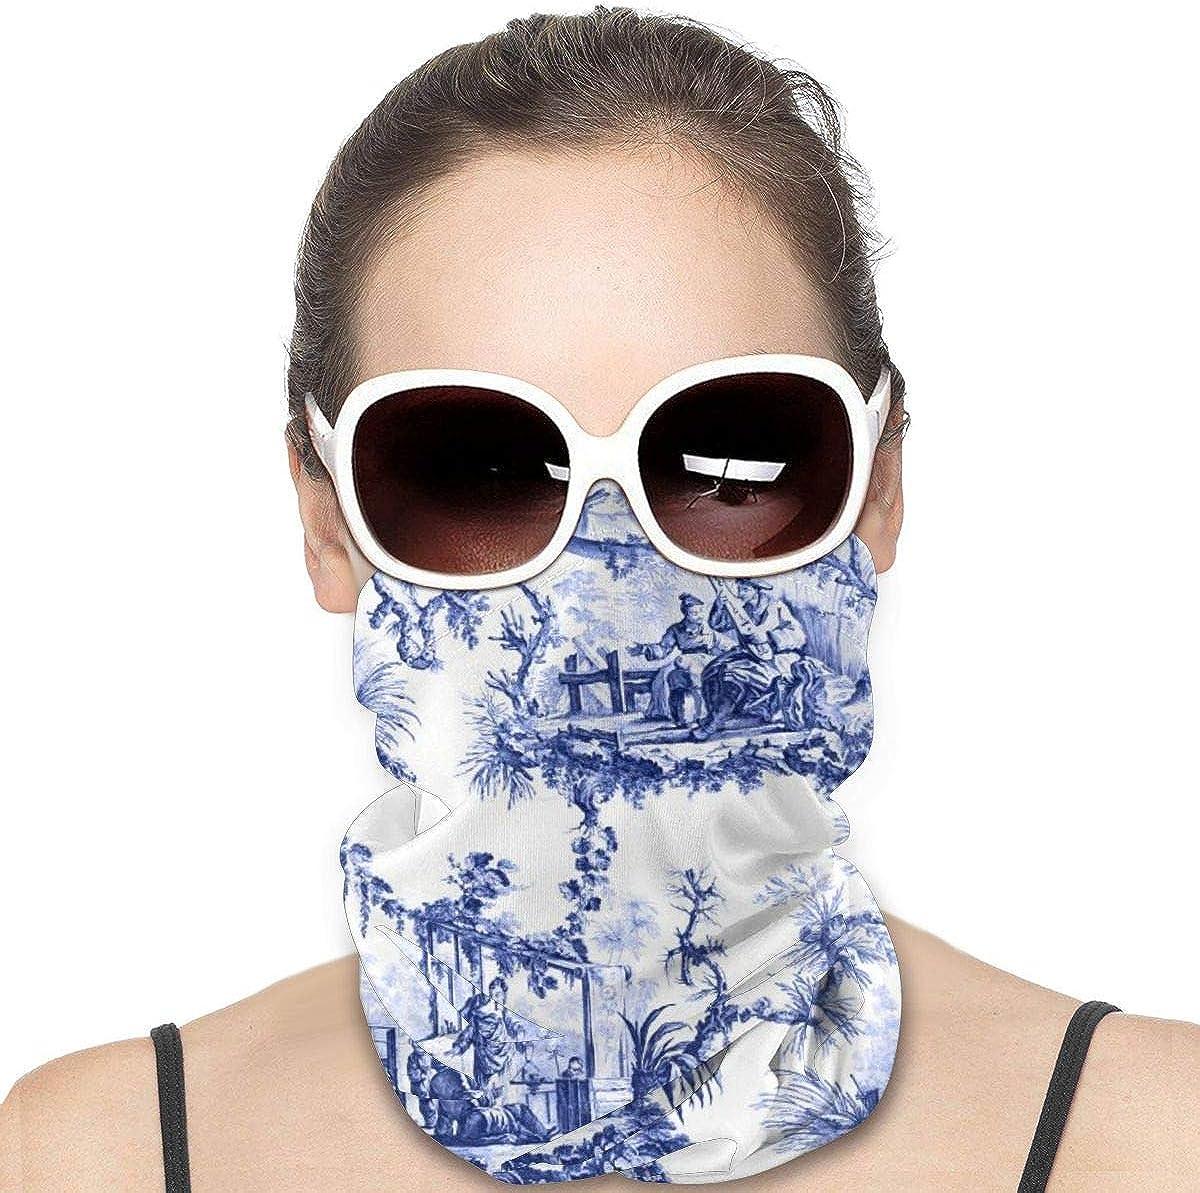 JinSPef Motorcycle Masks for Men - Chinoiserie Blue and White Bandana Face Mask Bandana Face Mask Face Scarf Head Bands Neck Warmer Men Headband Neck Gaiter